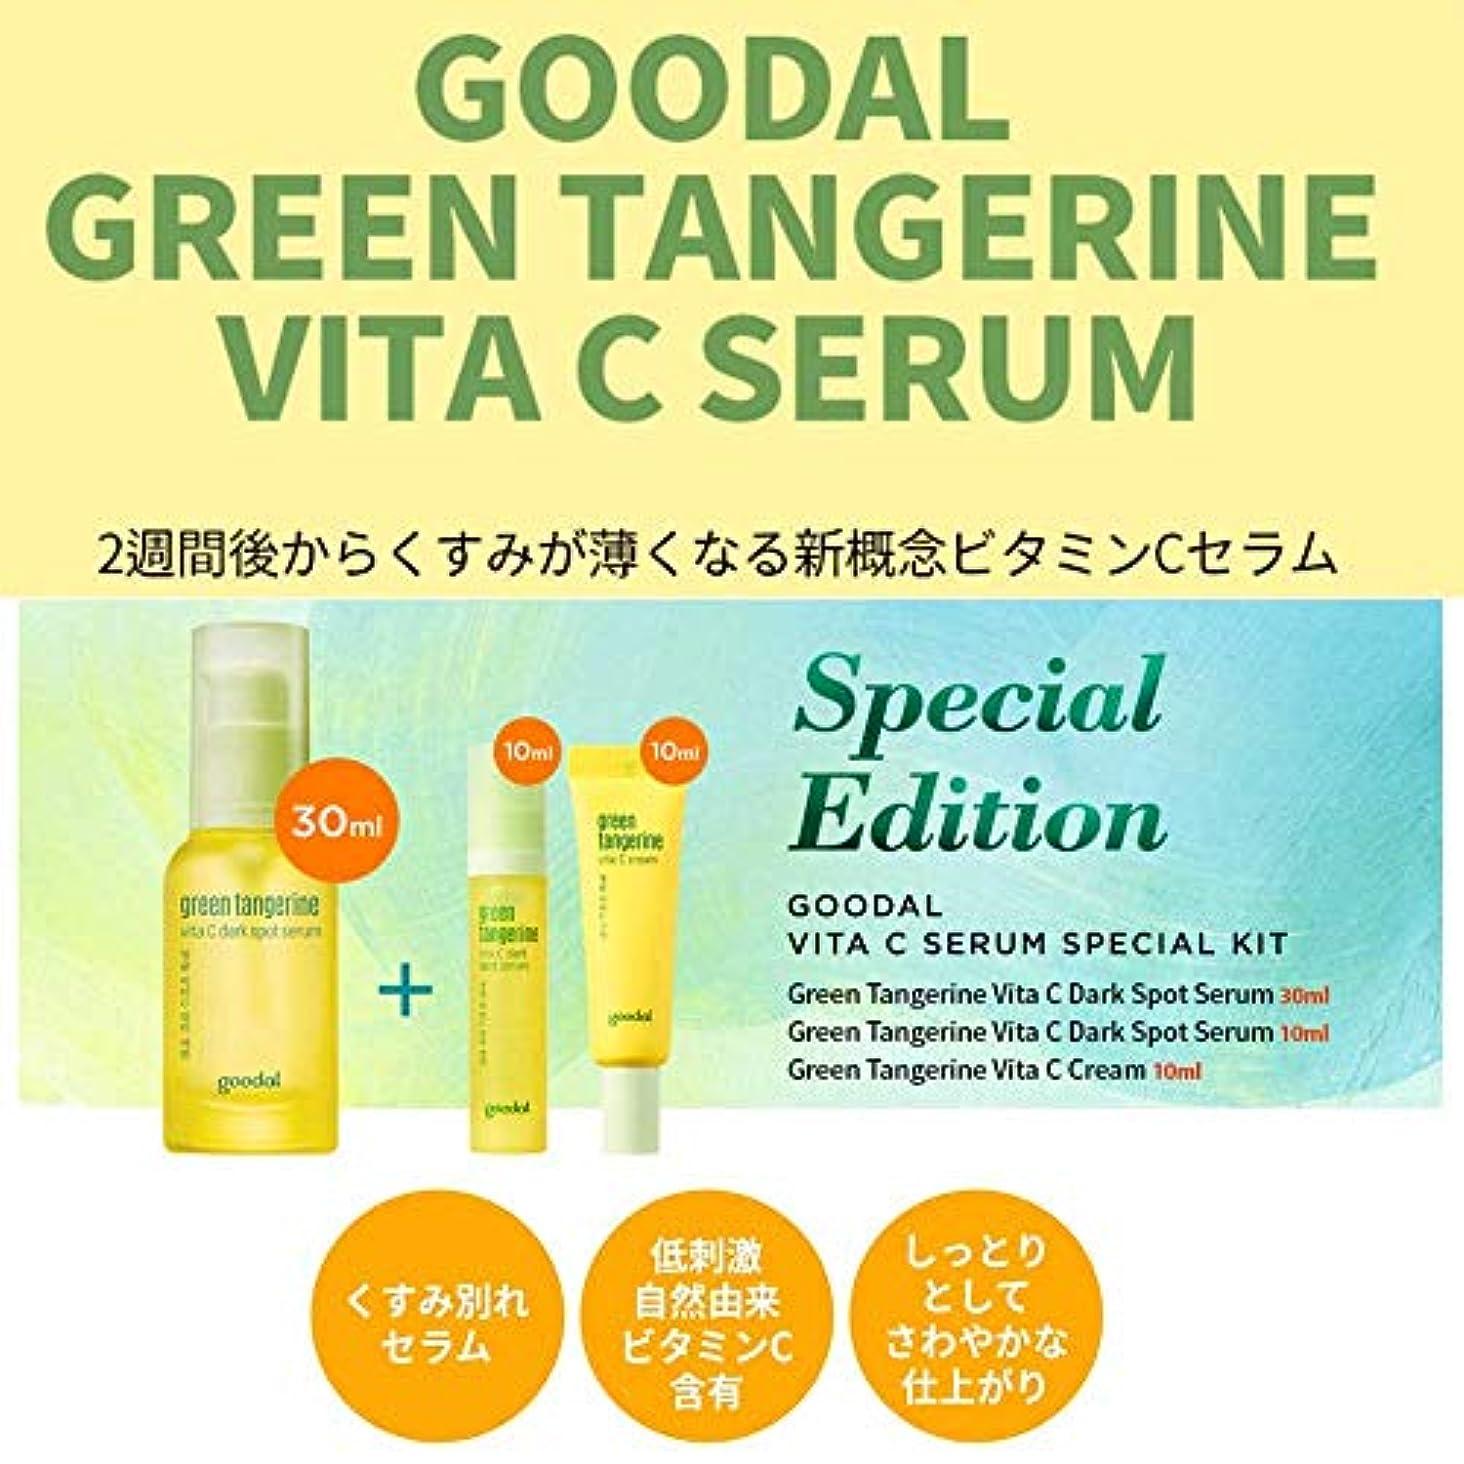 goodal SPECIAL EDITION(SERUM SET)グドールチョンギュルヴィータCくすみ血清 30ml +10ml+10ml